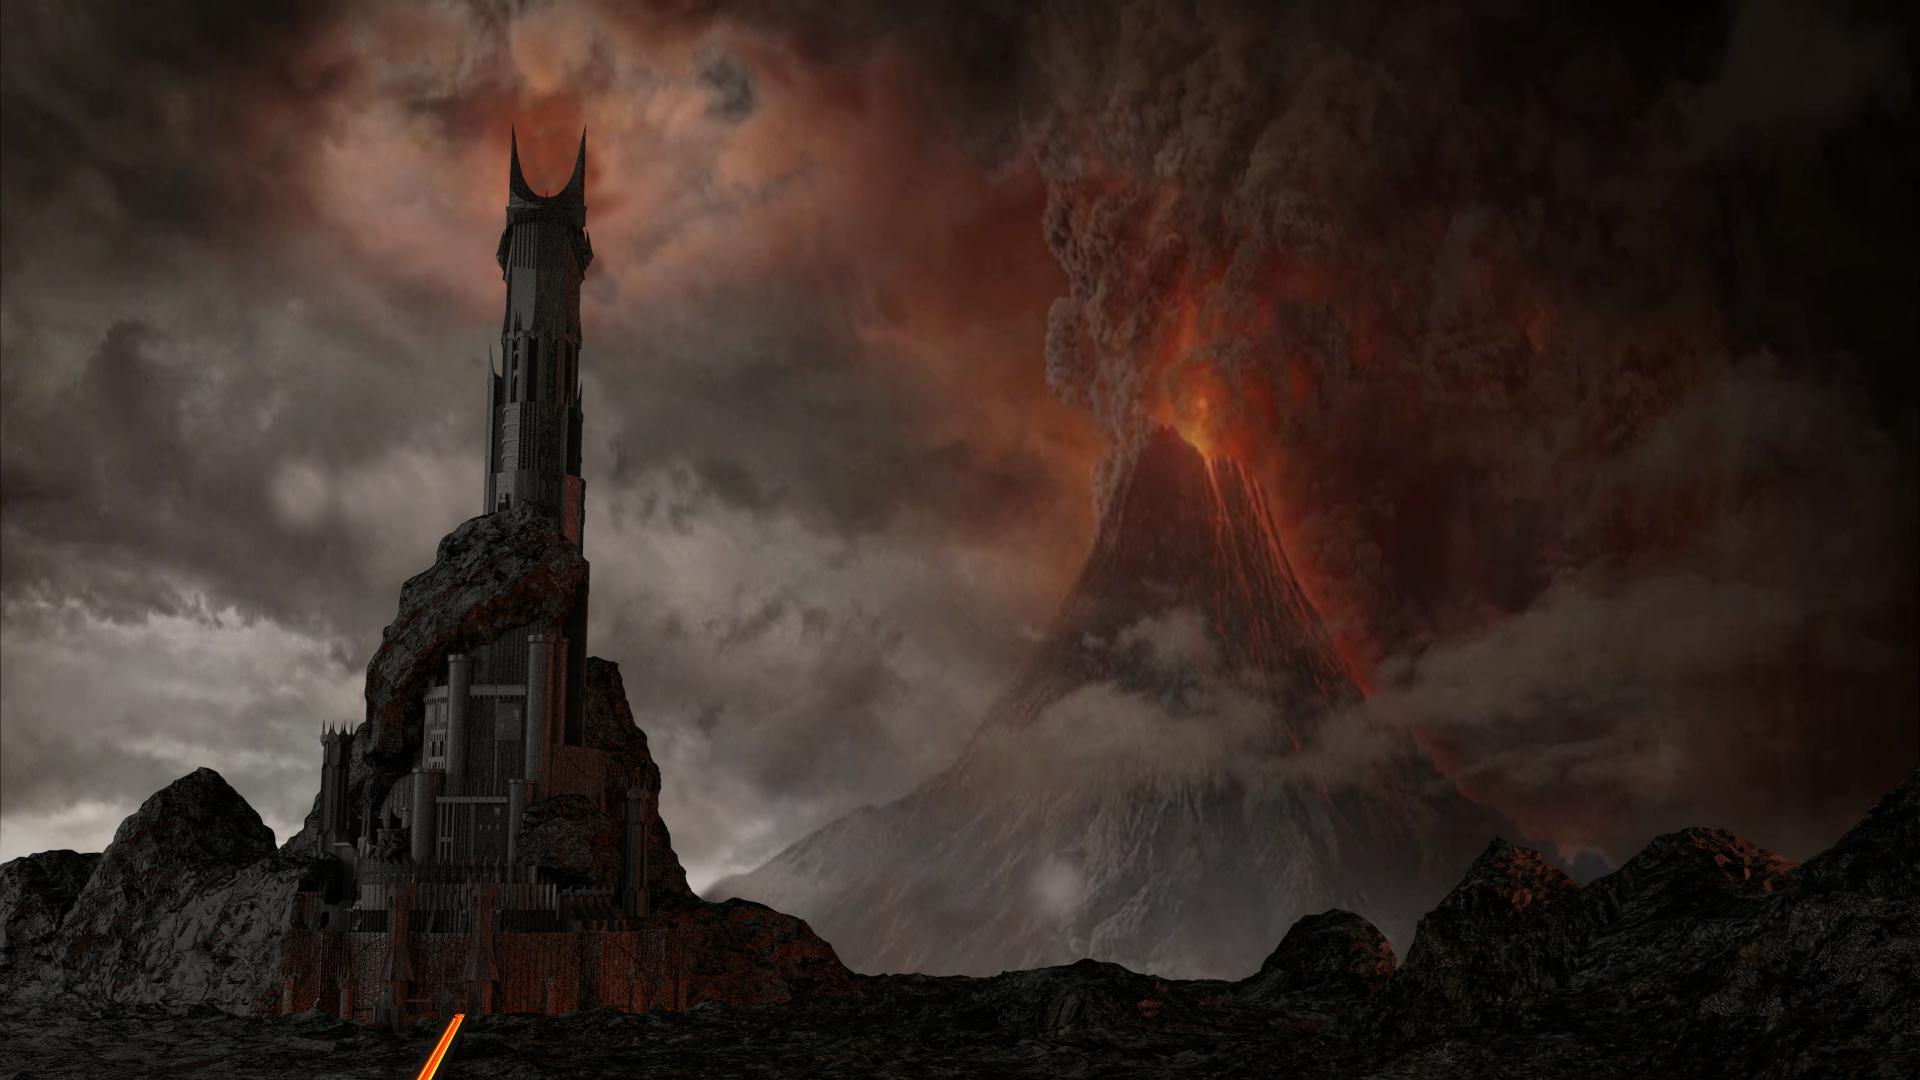 The Dark Tower of Barad-Dur